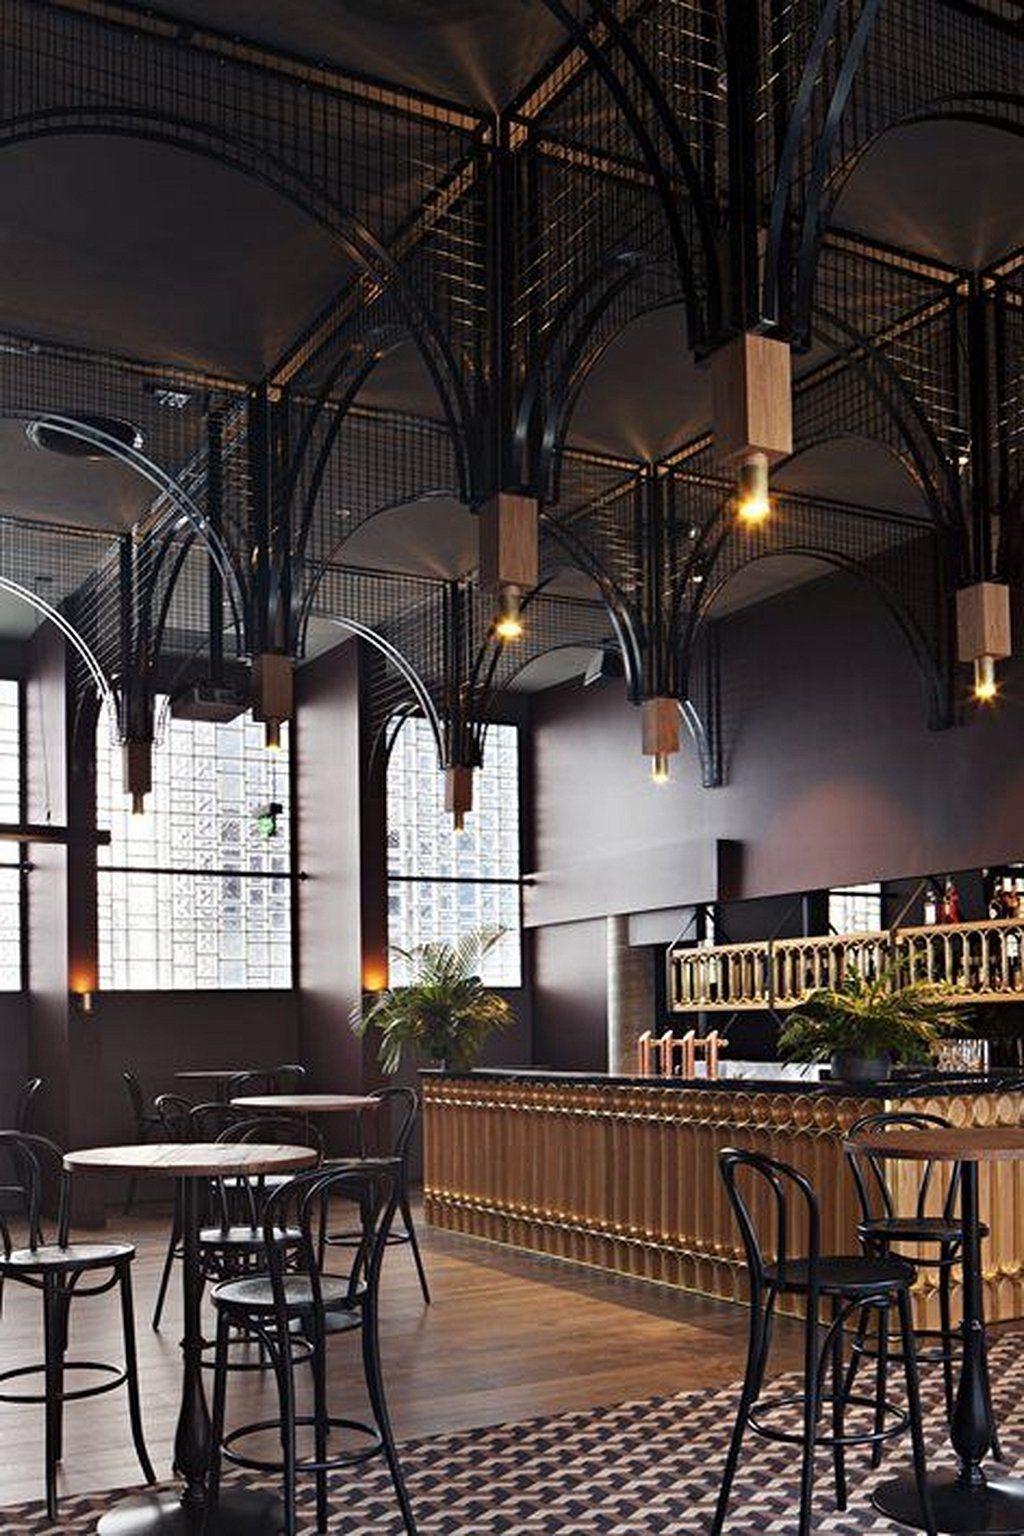 Cafe Interior Ideas Creative 2 MOBmasker Cafe bar